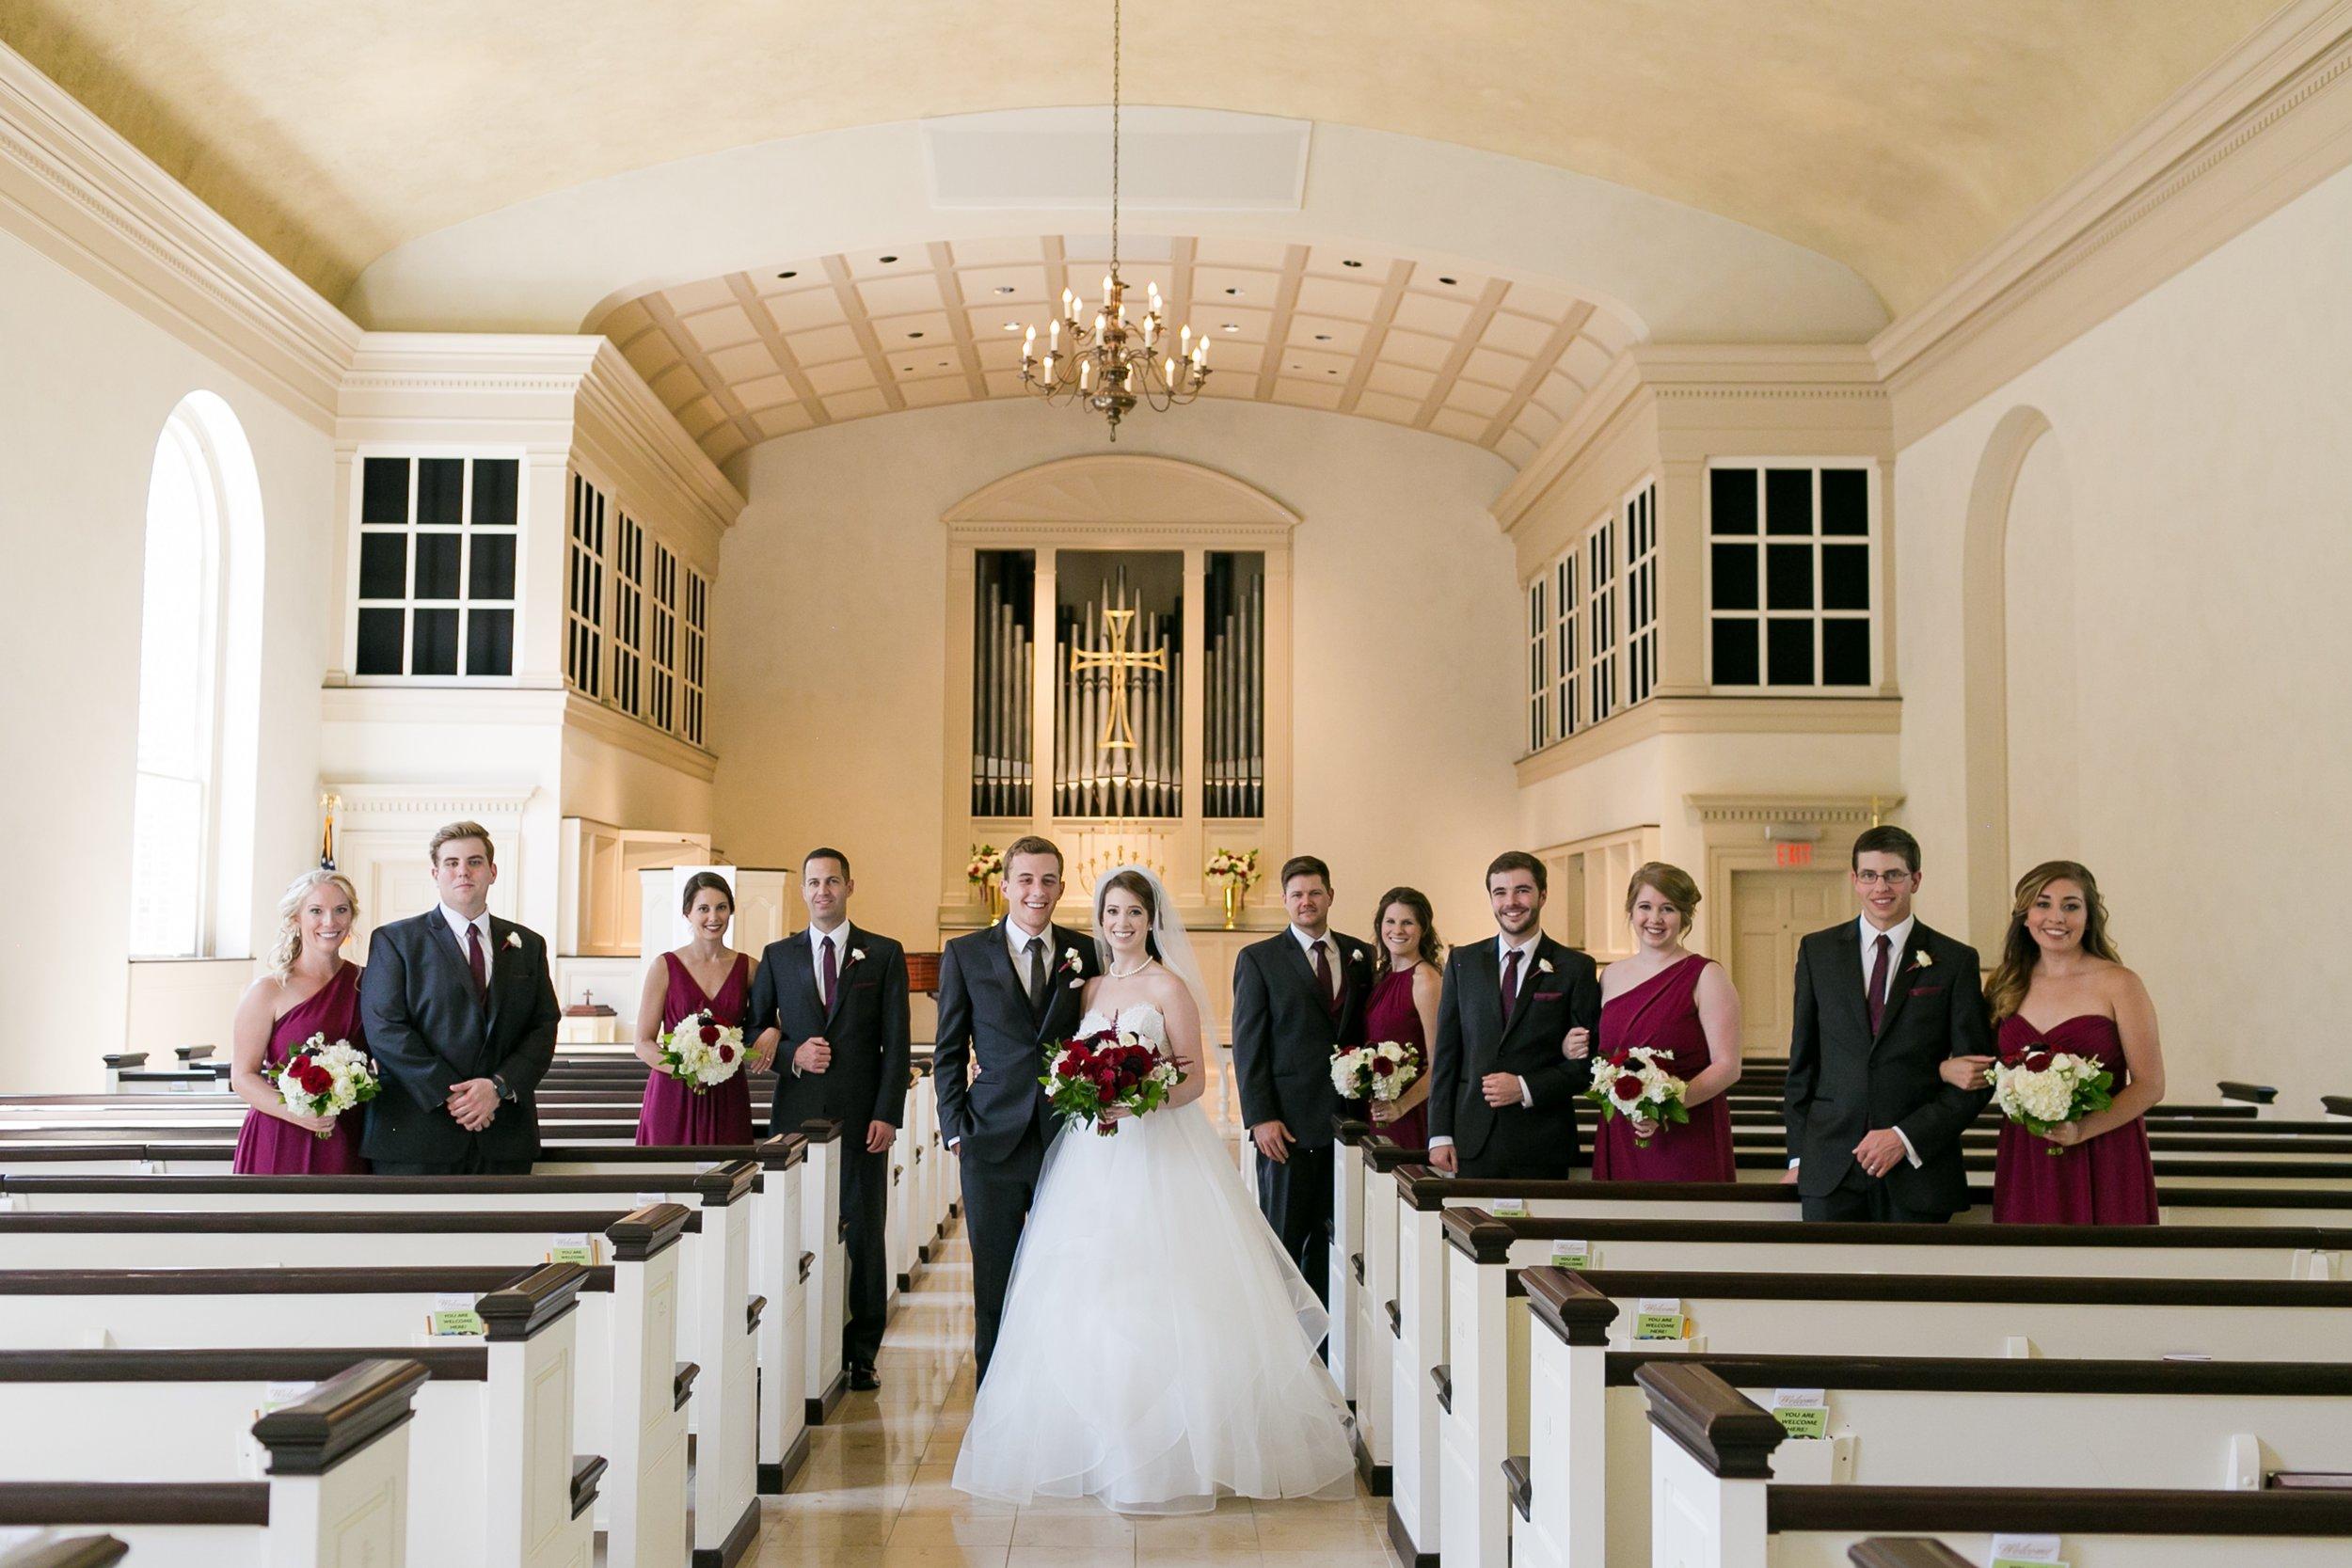 2017Sept9-Kay-Wedding-MissionTheatre-0333.jpg